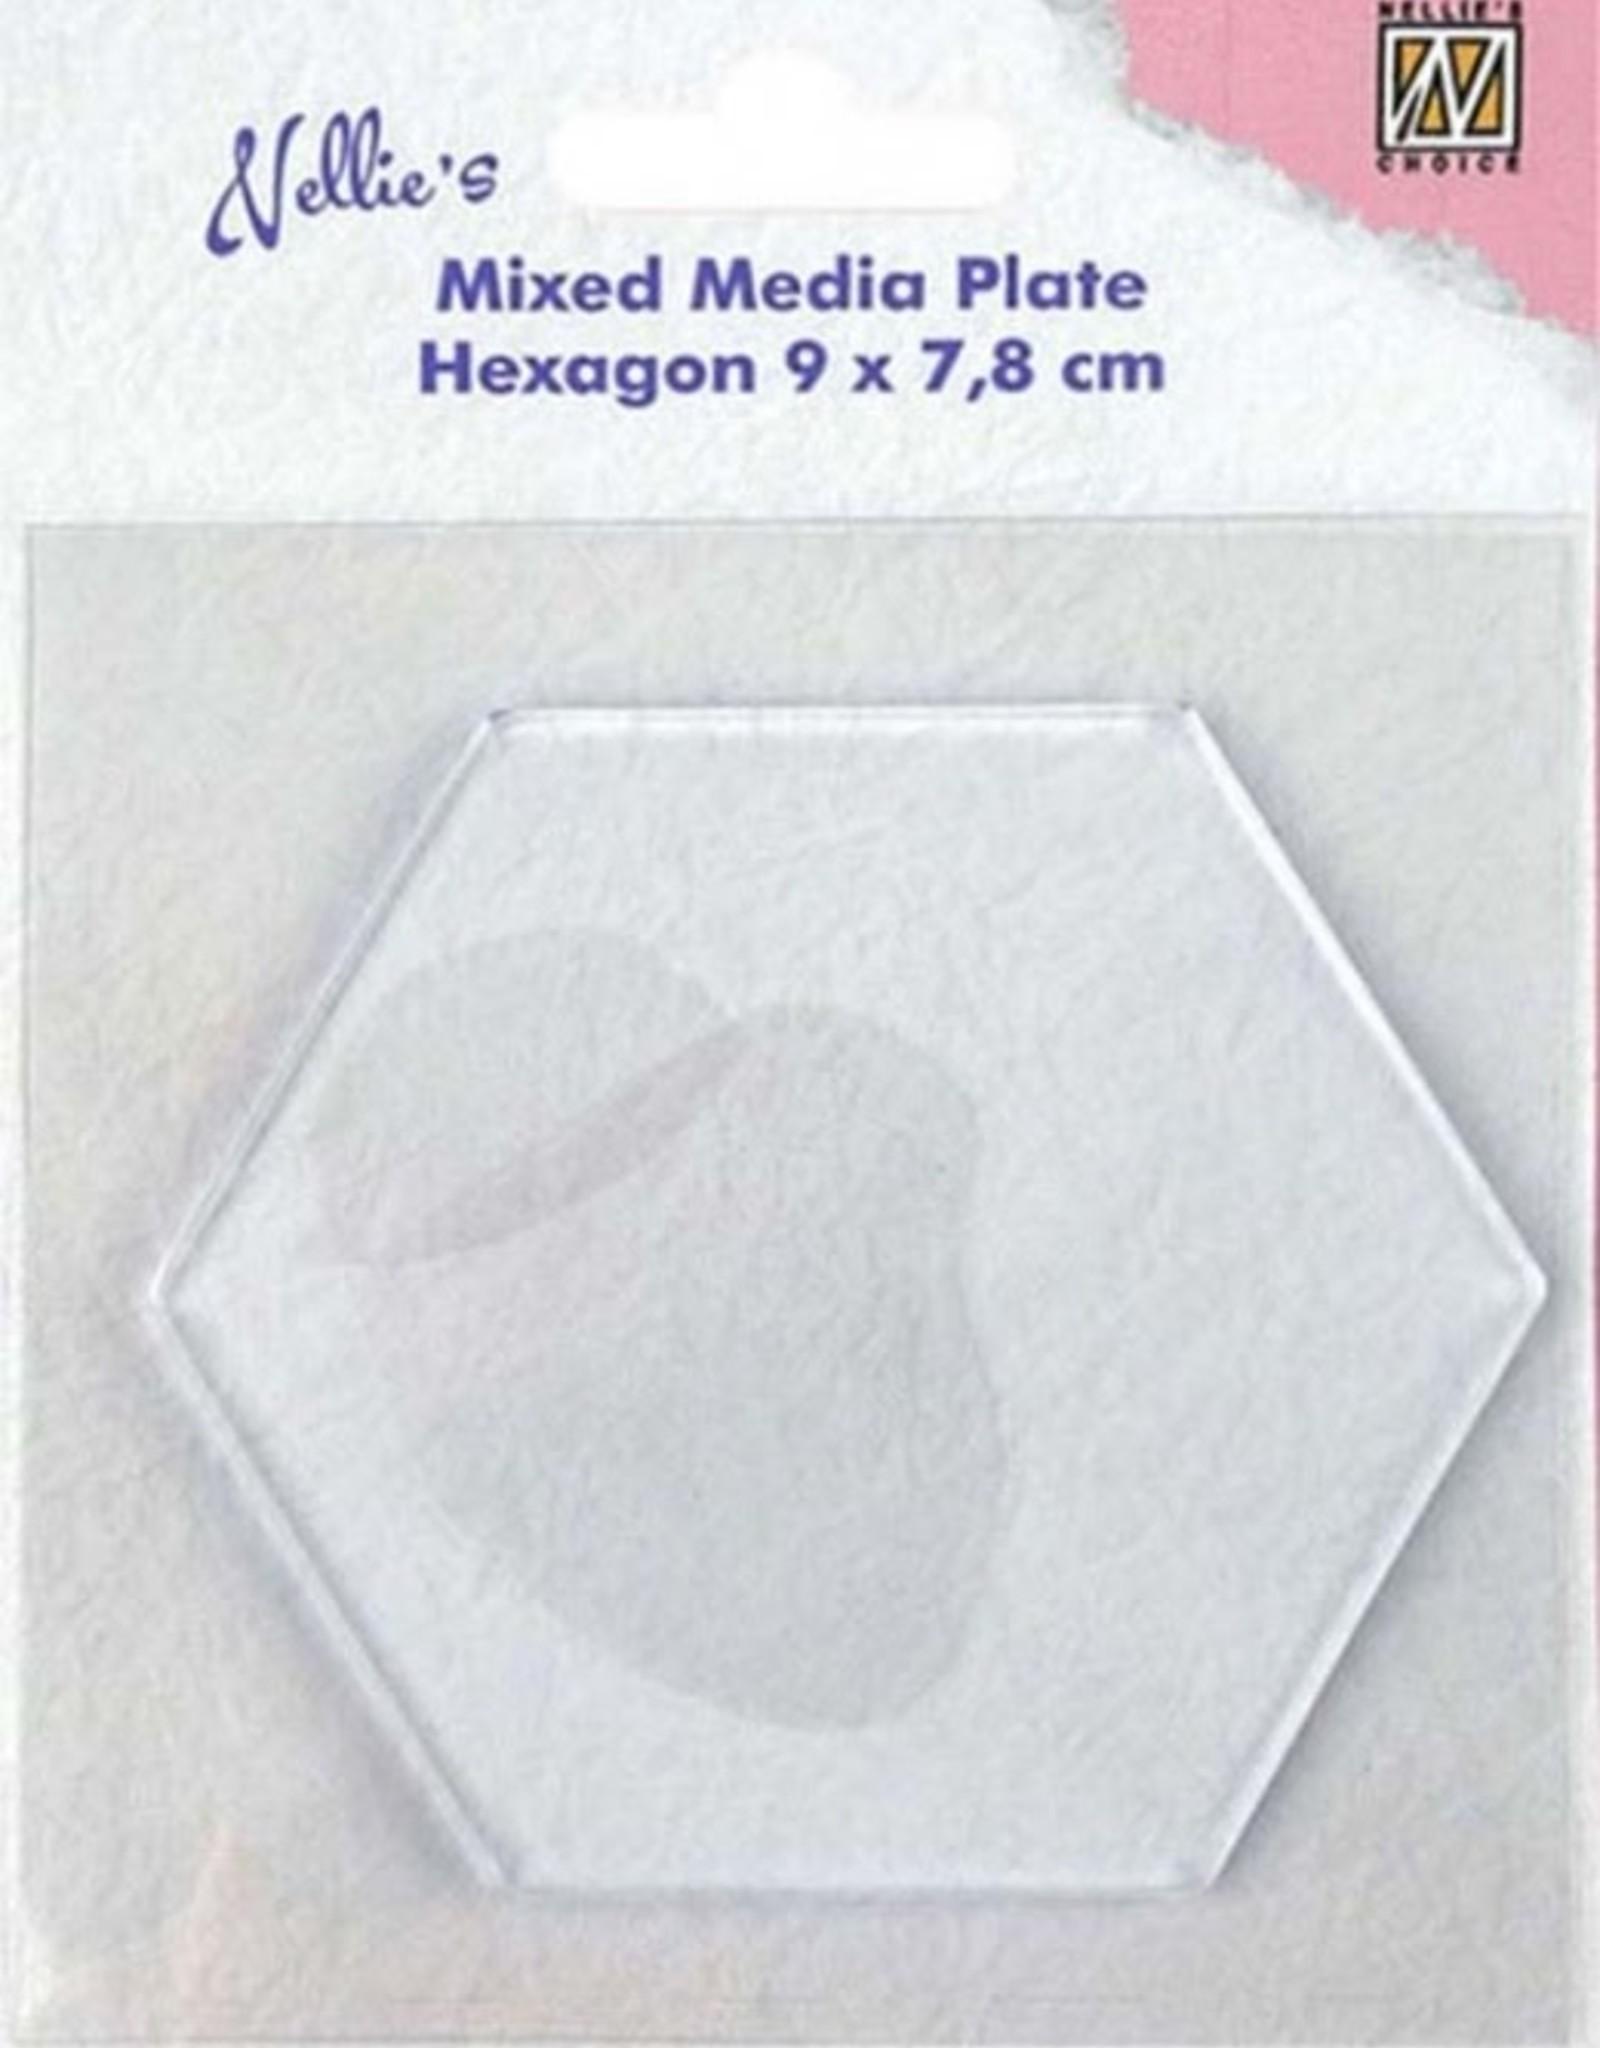 Mixed Media Plate Hexagon